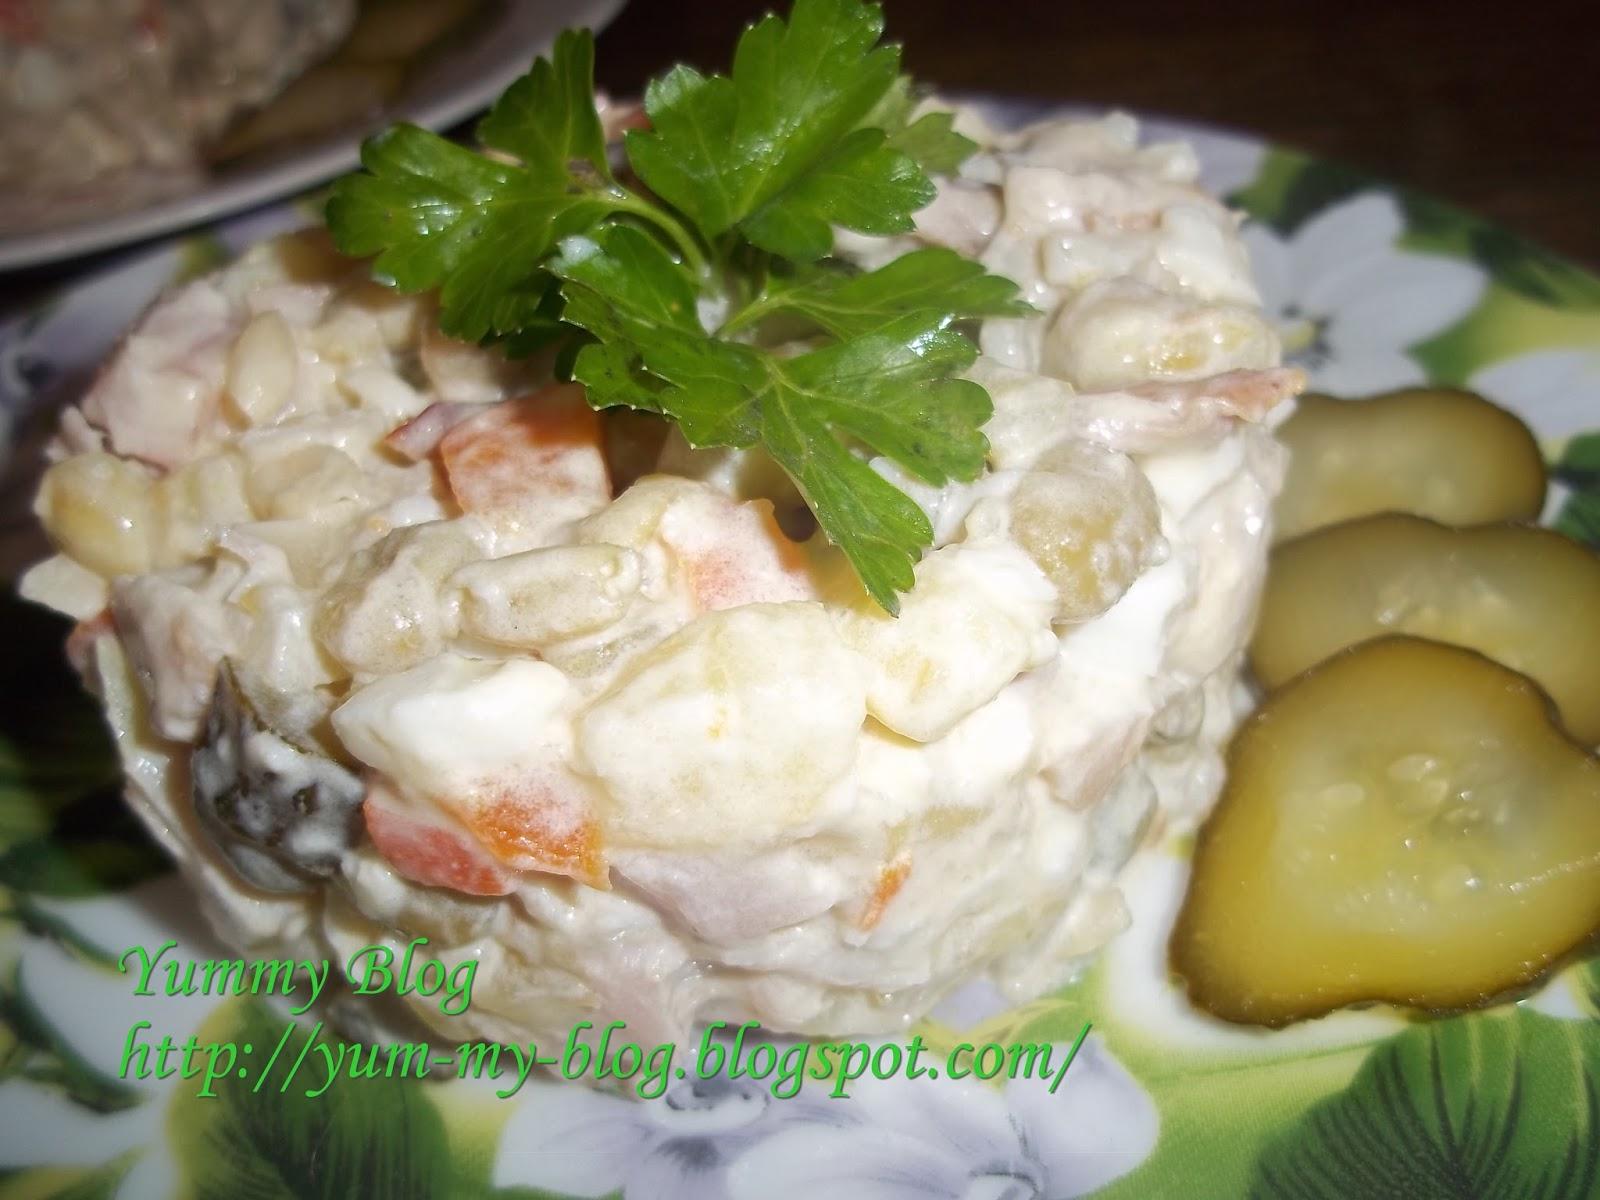 салат 1 января рецепт с фото из курицы